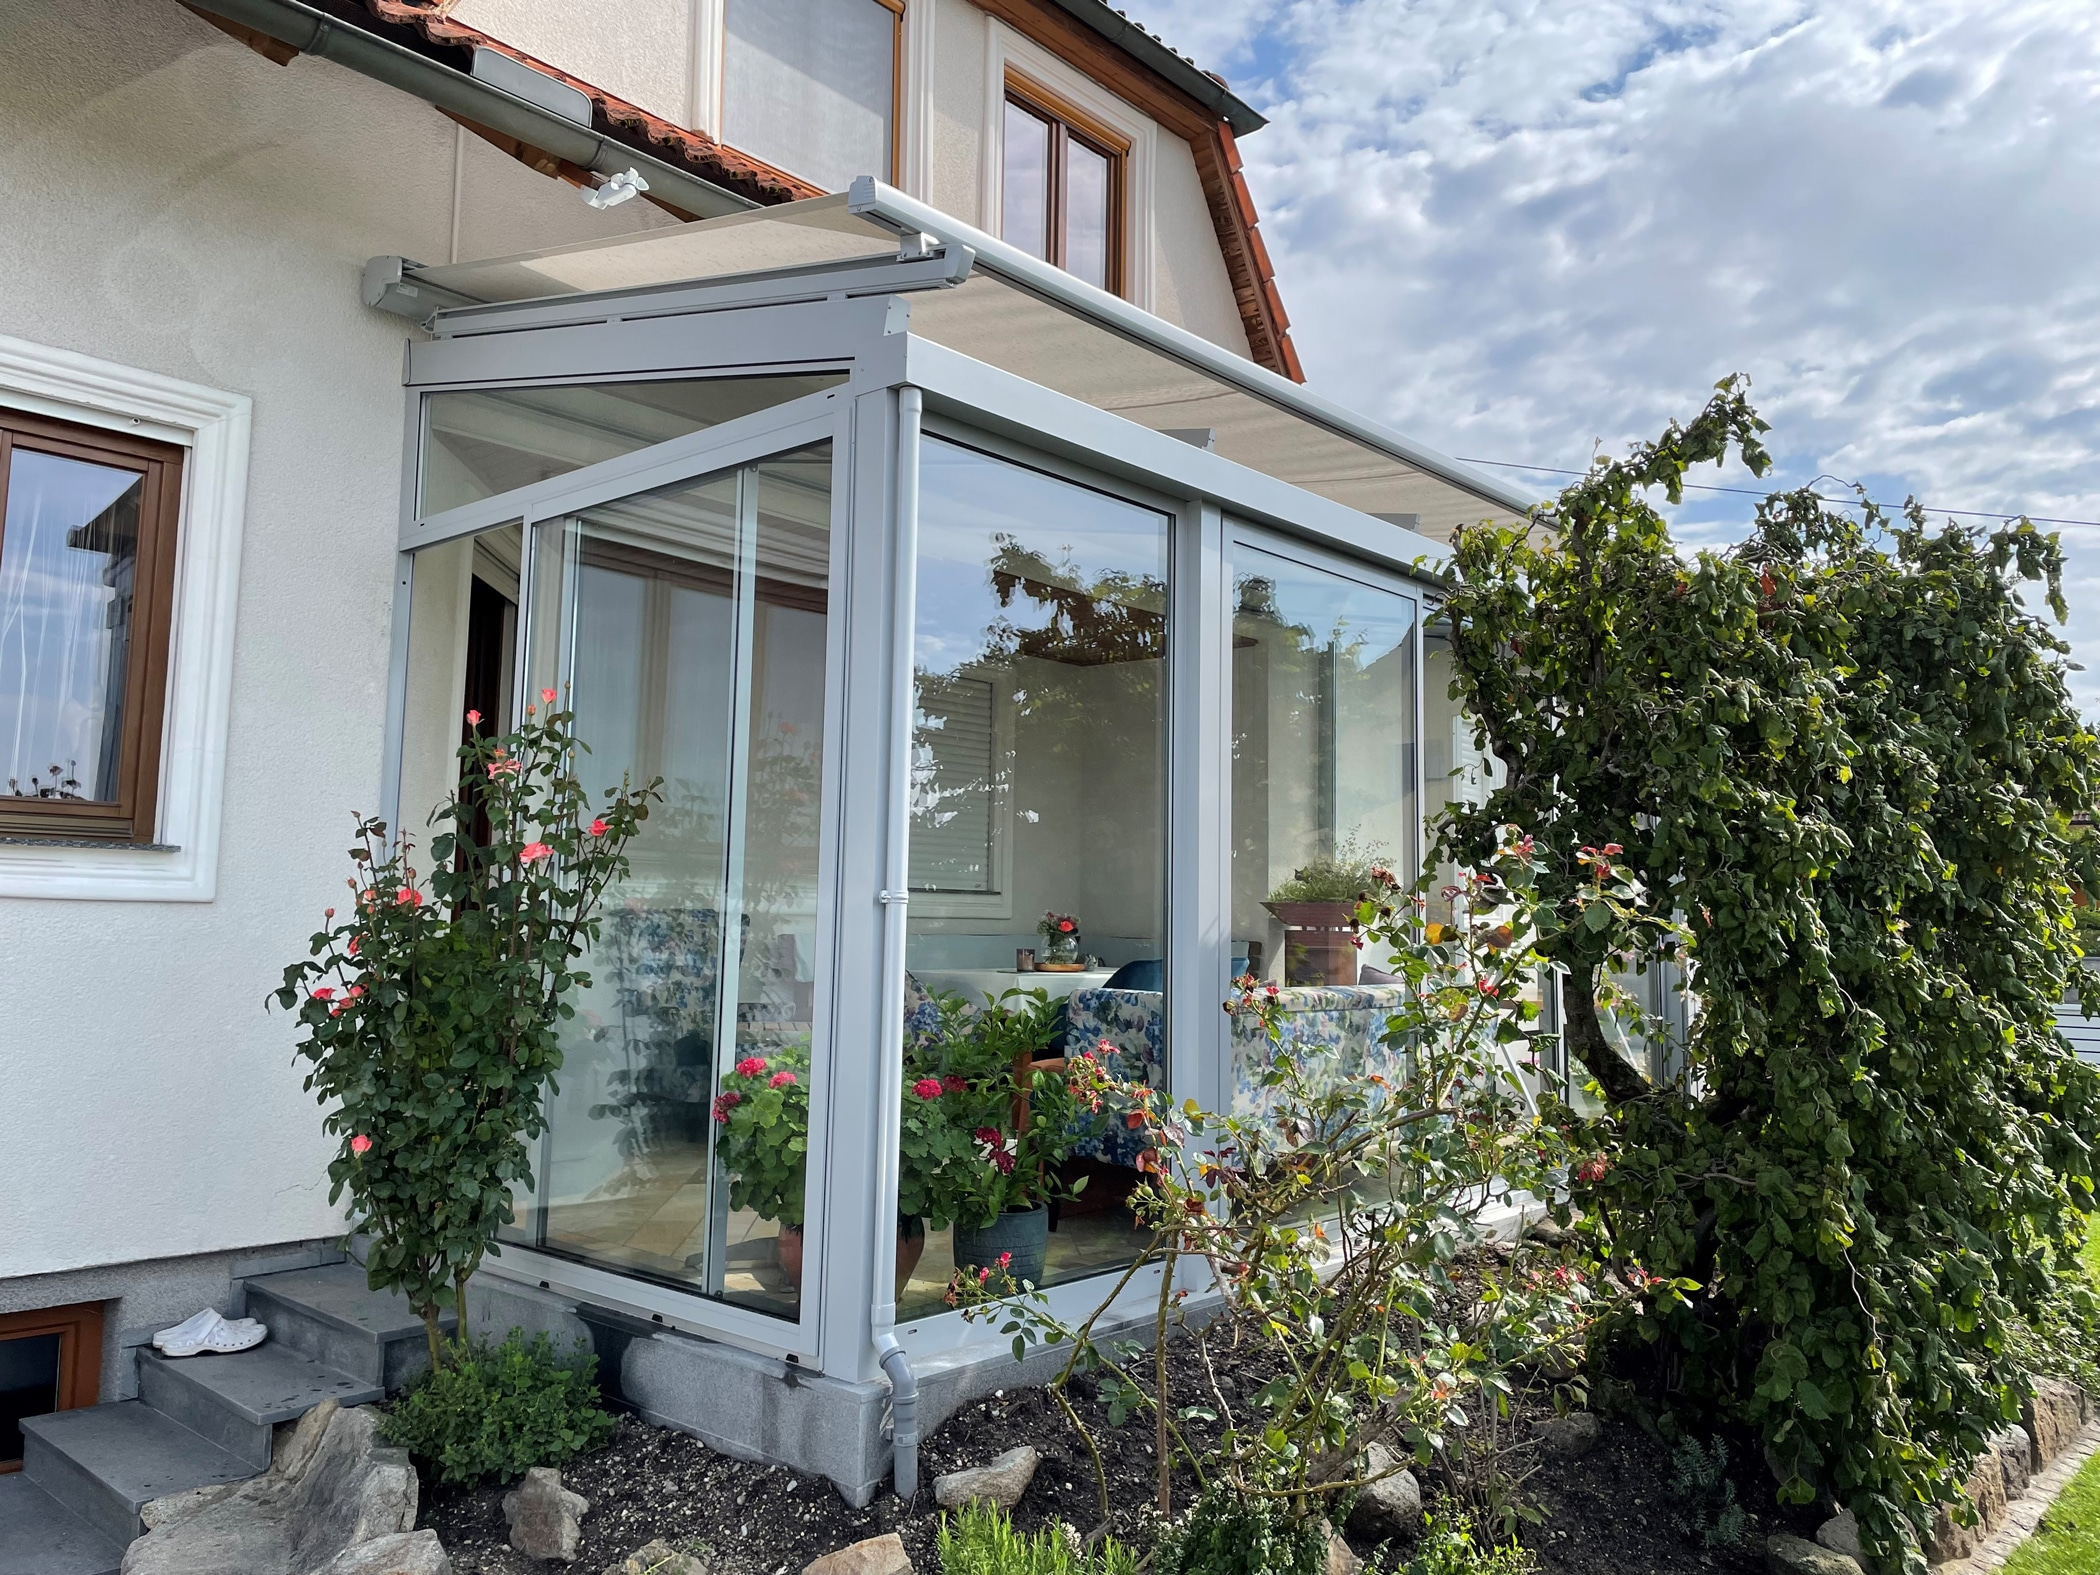 Wintergarten System Chill-Lounge in 4320 Perg